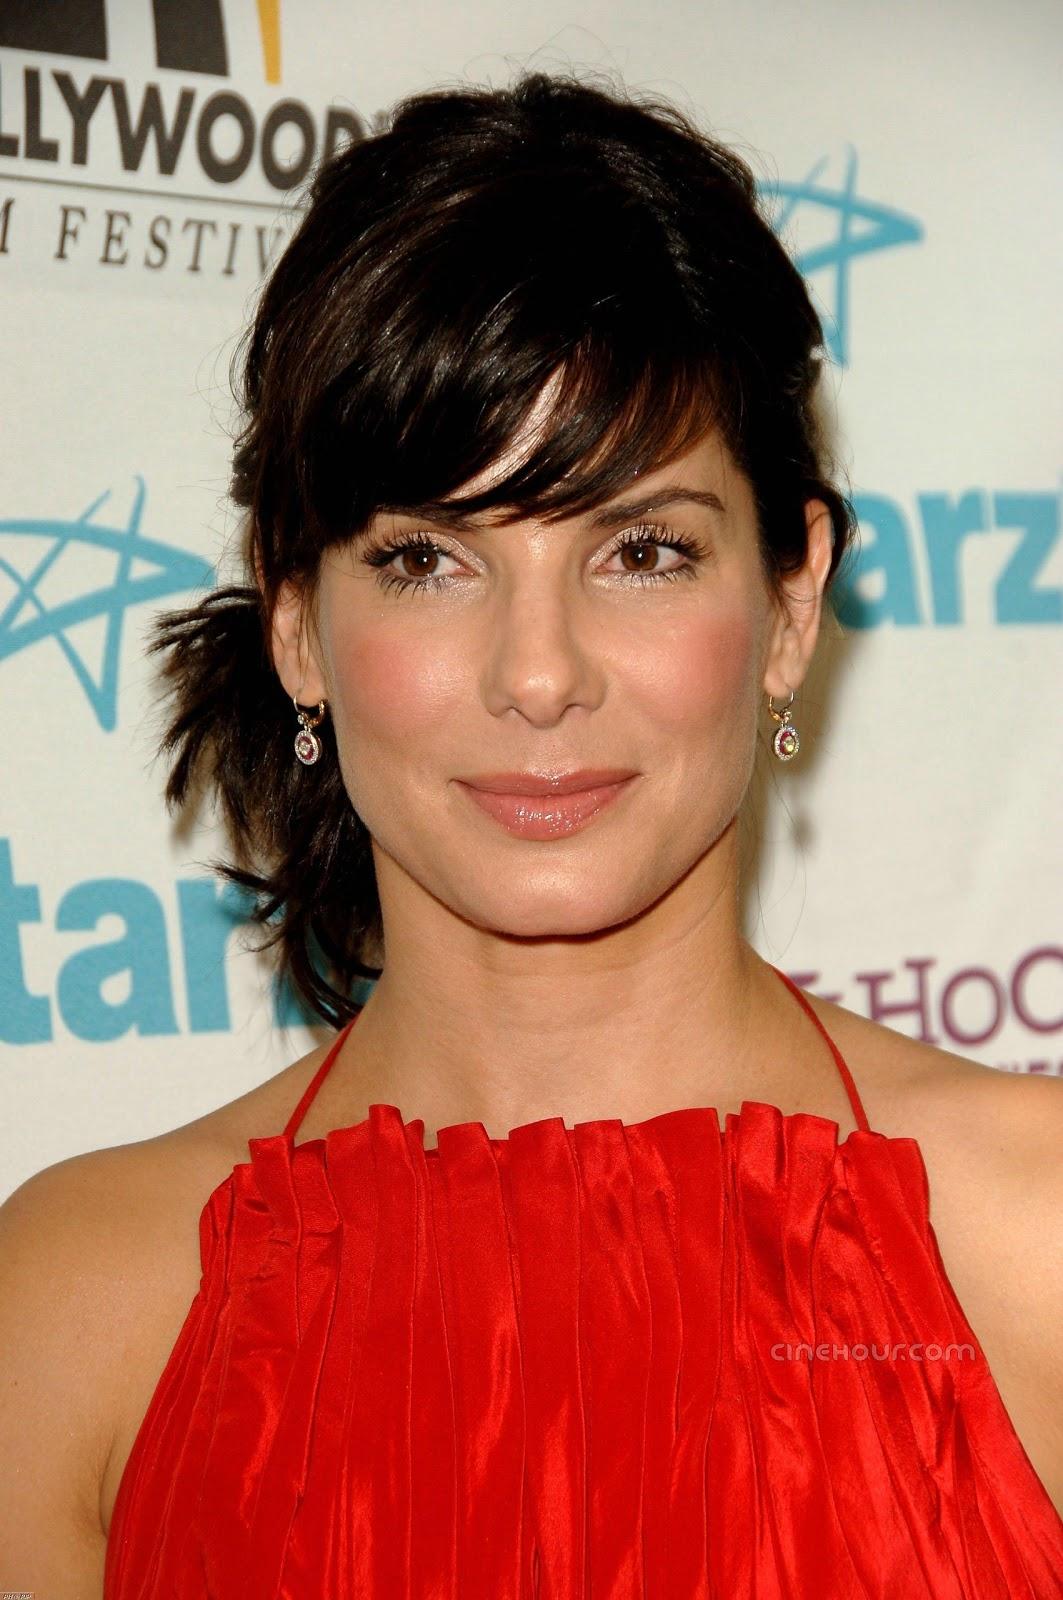 http://1.bp.blogspot.com/-8cUze948pDE/Tt892APKtFI/AAAAAAAABCw/yczGZq2nkvs/s1600/Sandra-Bullock-actress-film-movies-oscar-pics-images-photos-heroine-hairstyle-+%25281%2529.jpg